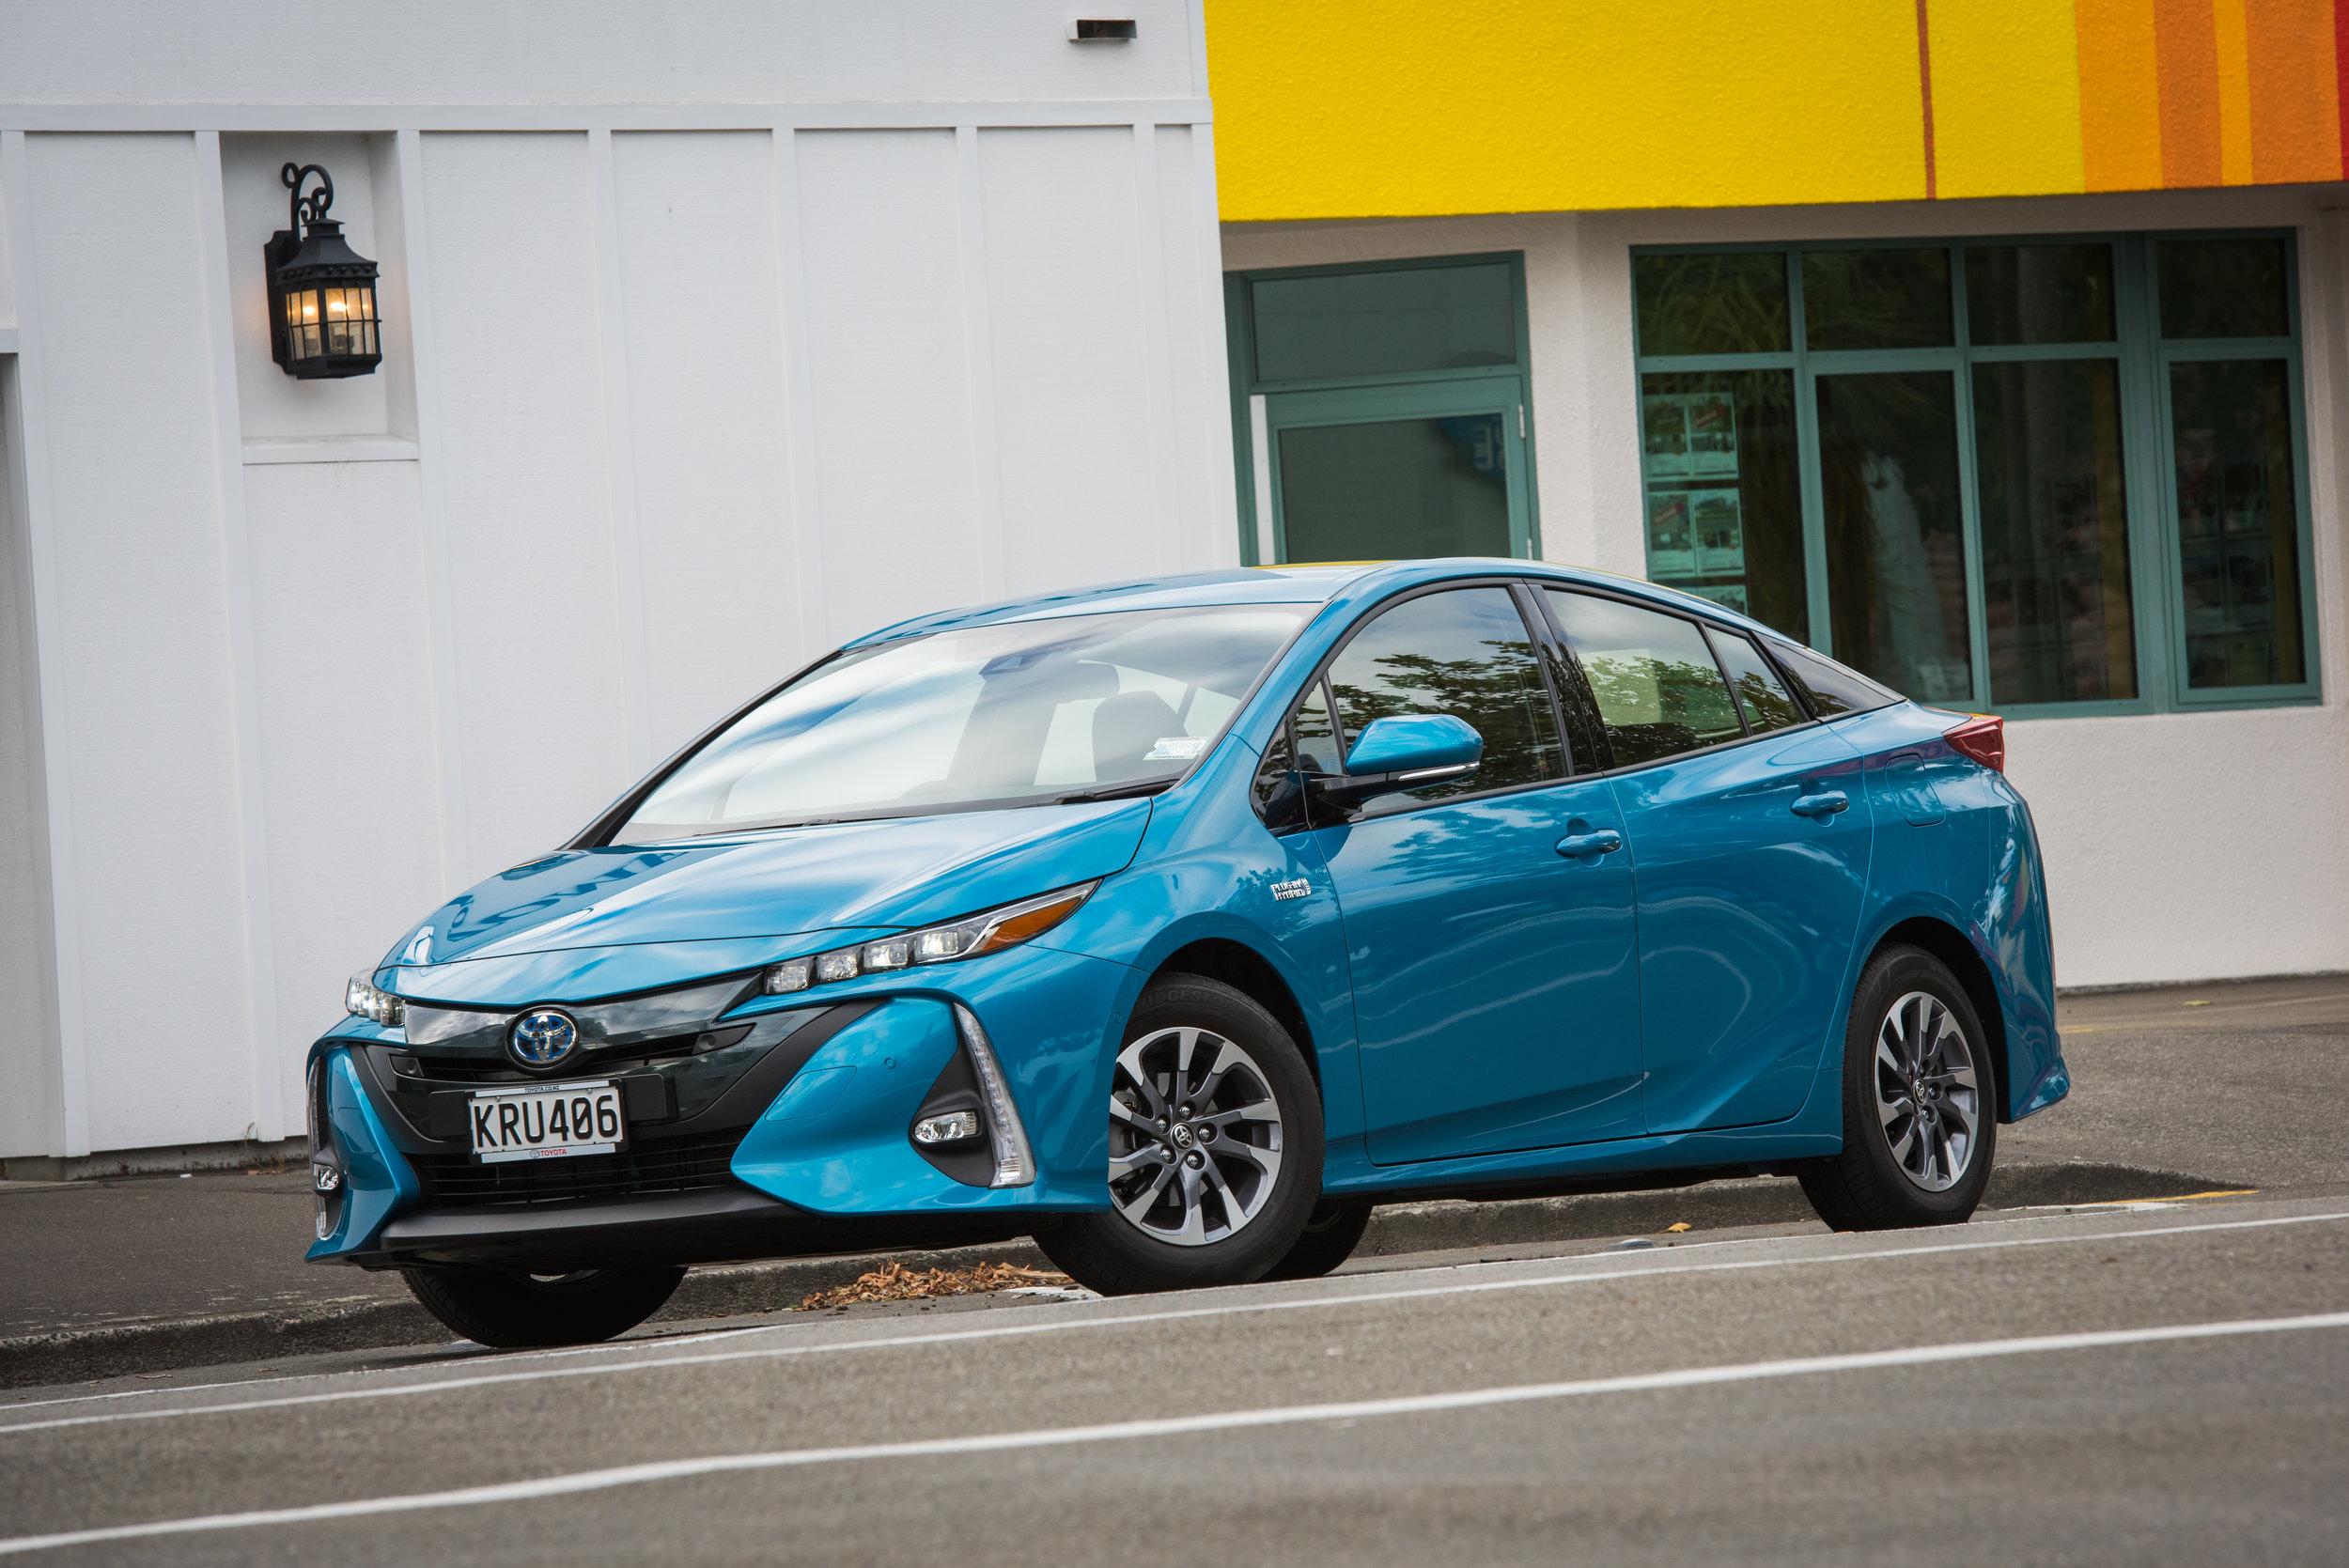 2018 Toyota Prius Prime, Blue magnetism, front three quarter shot, parked.jpg